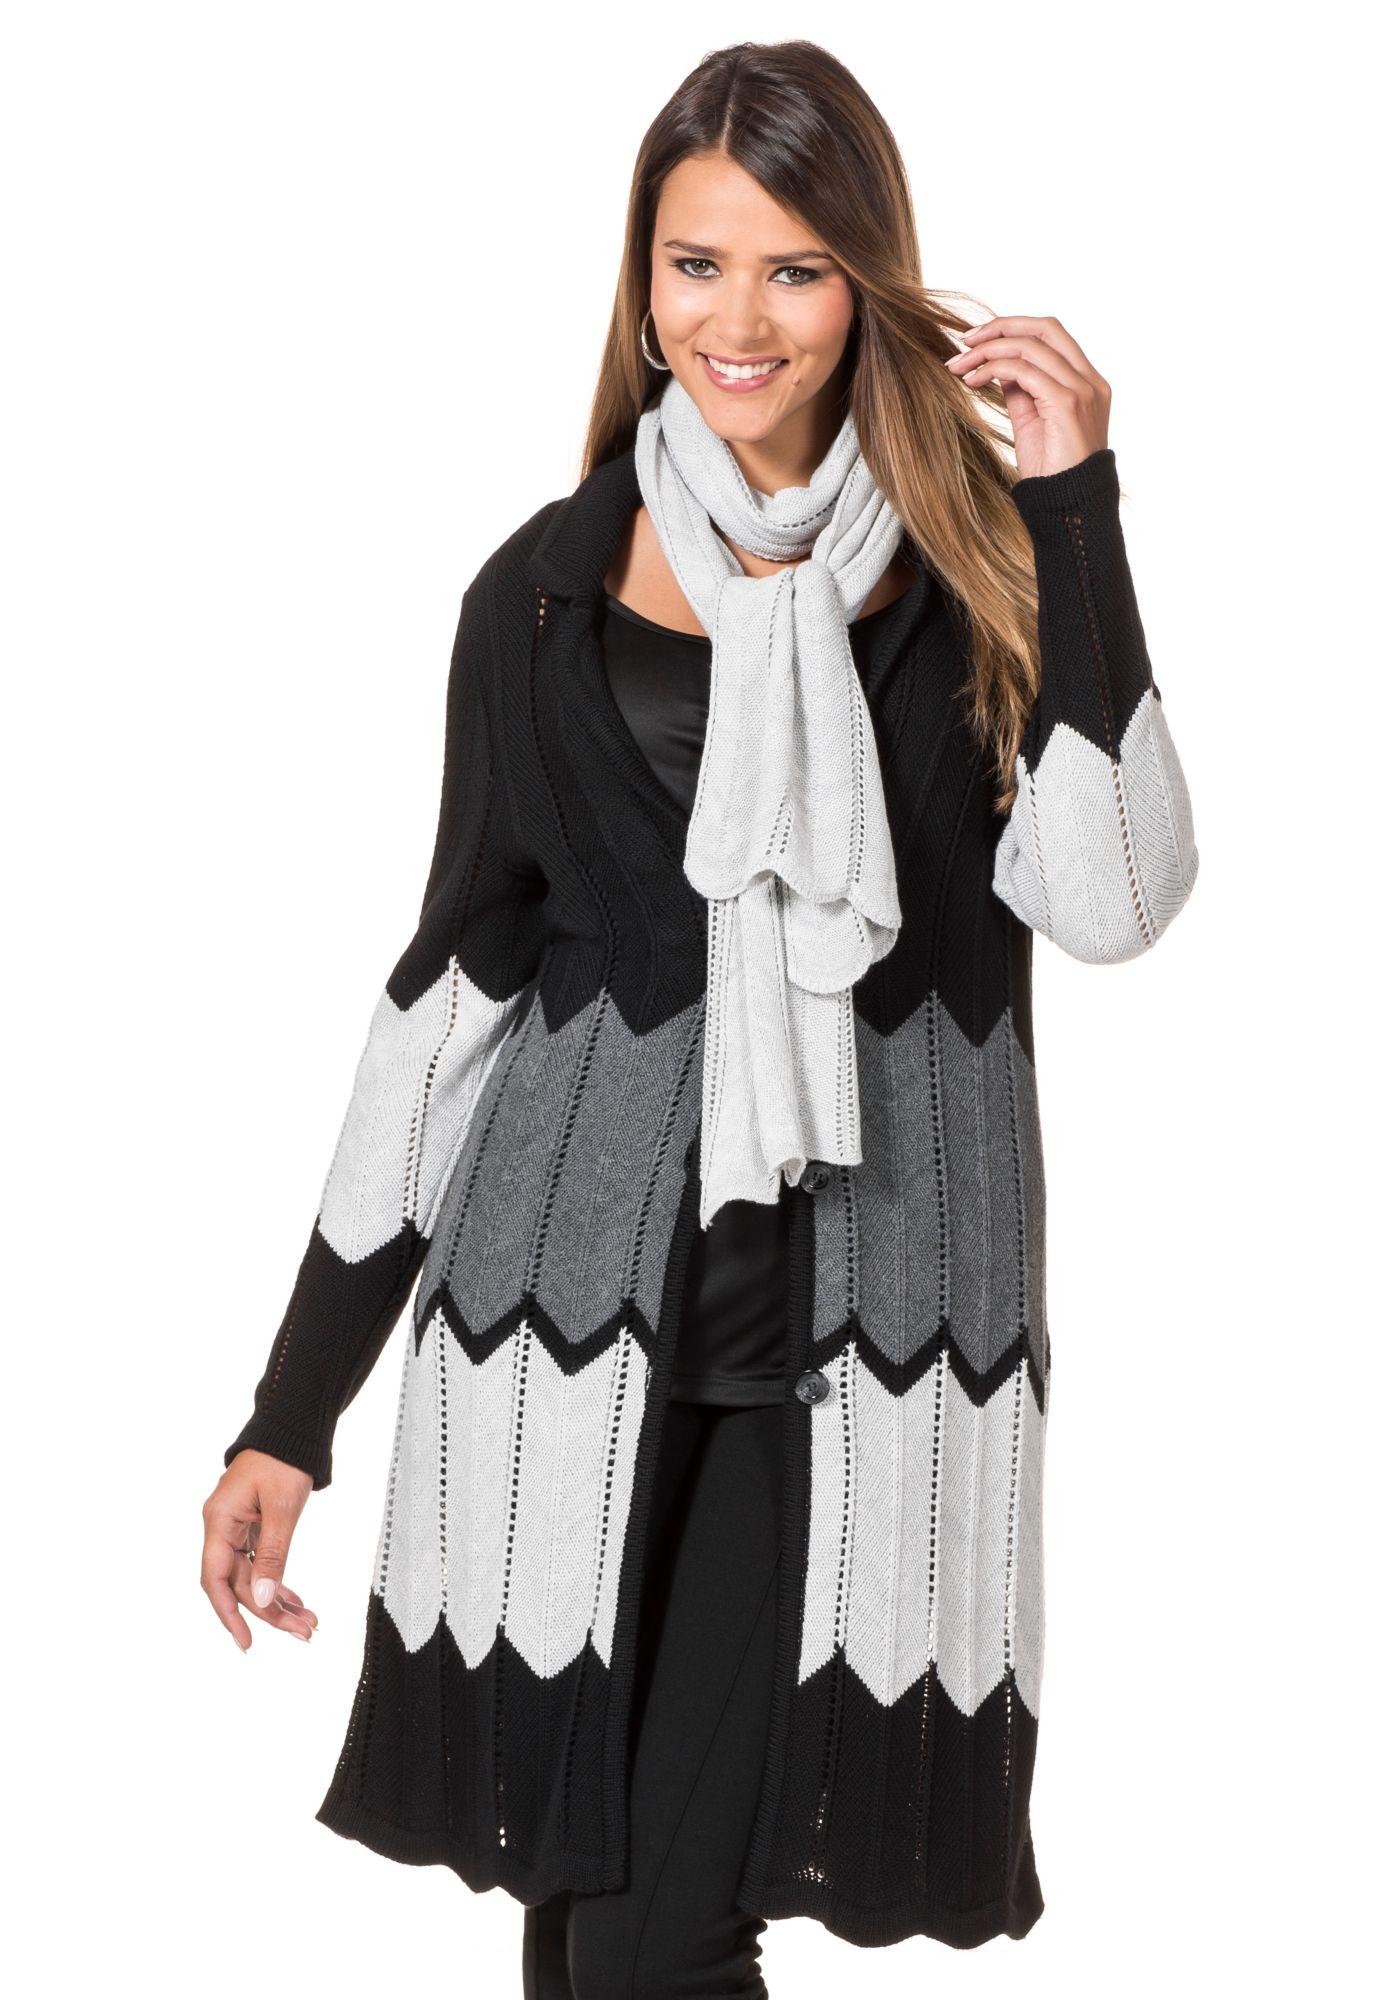 SHEEGO STYLE Style Strickmantel mit Schalschwarz-grau 40/42;44/46;48/50;52/54;56/58 schwarz